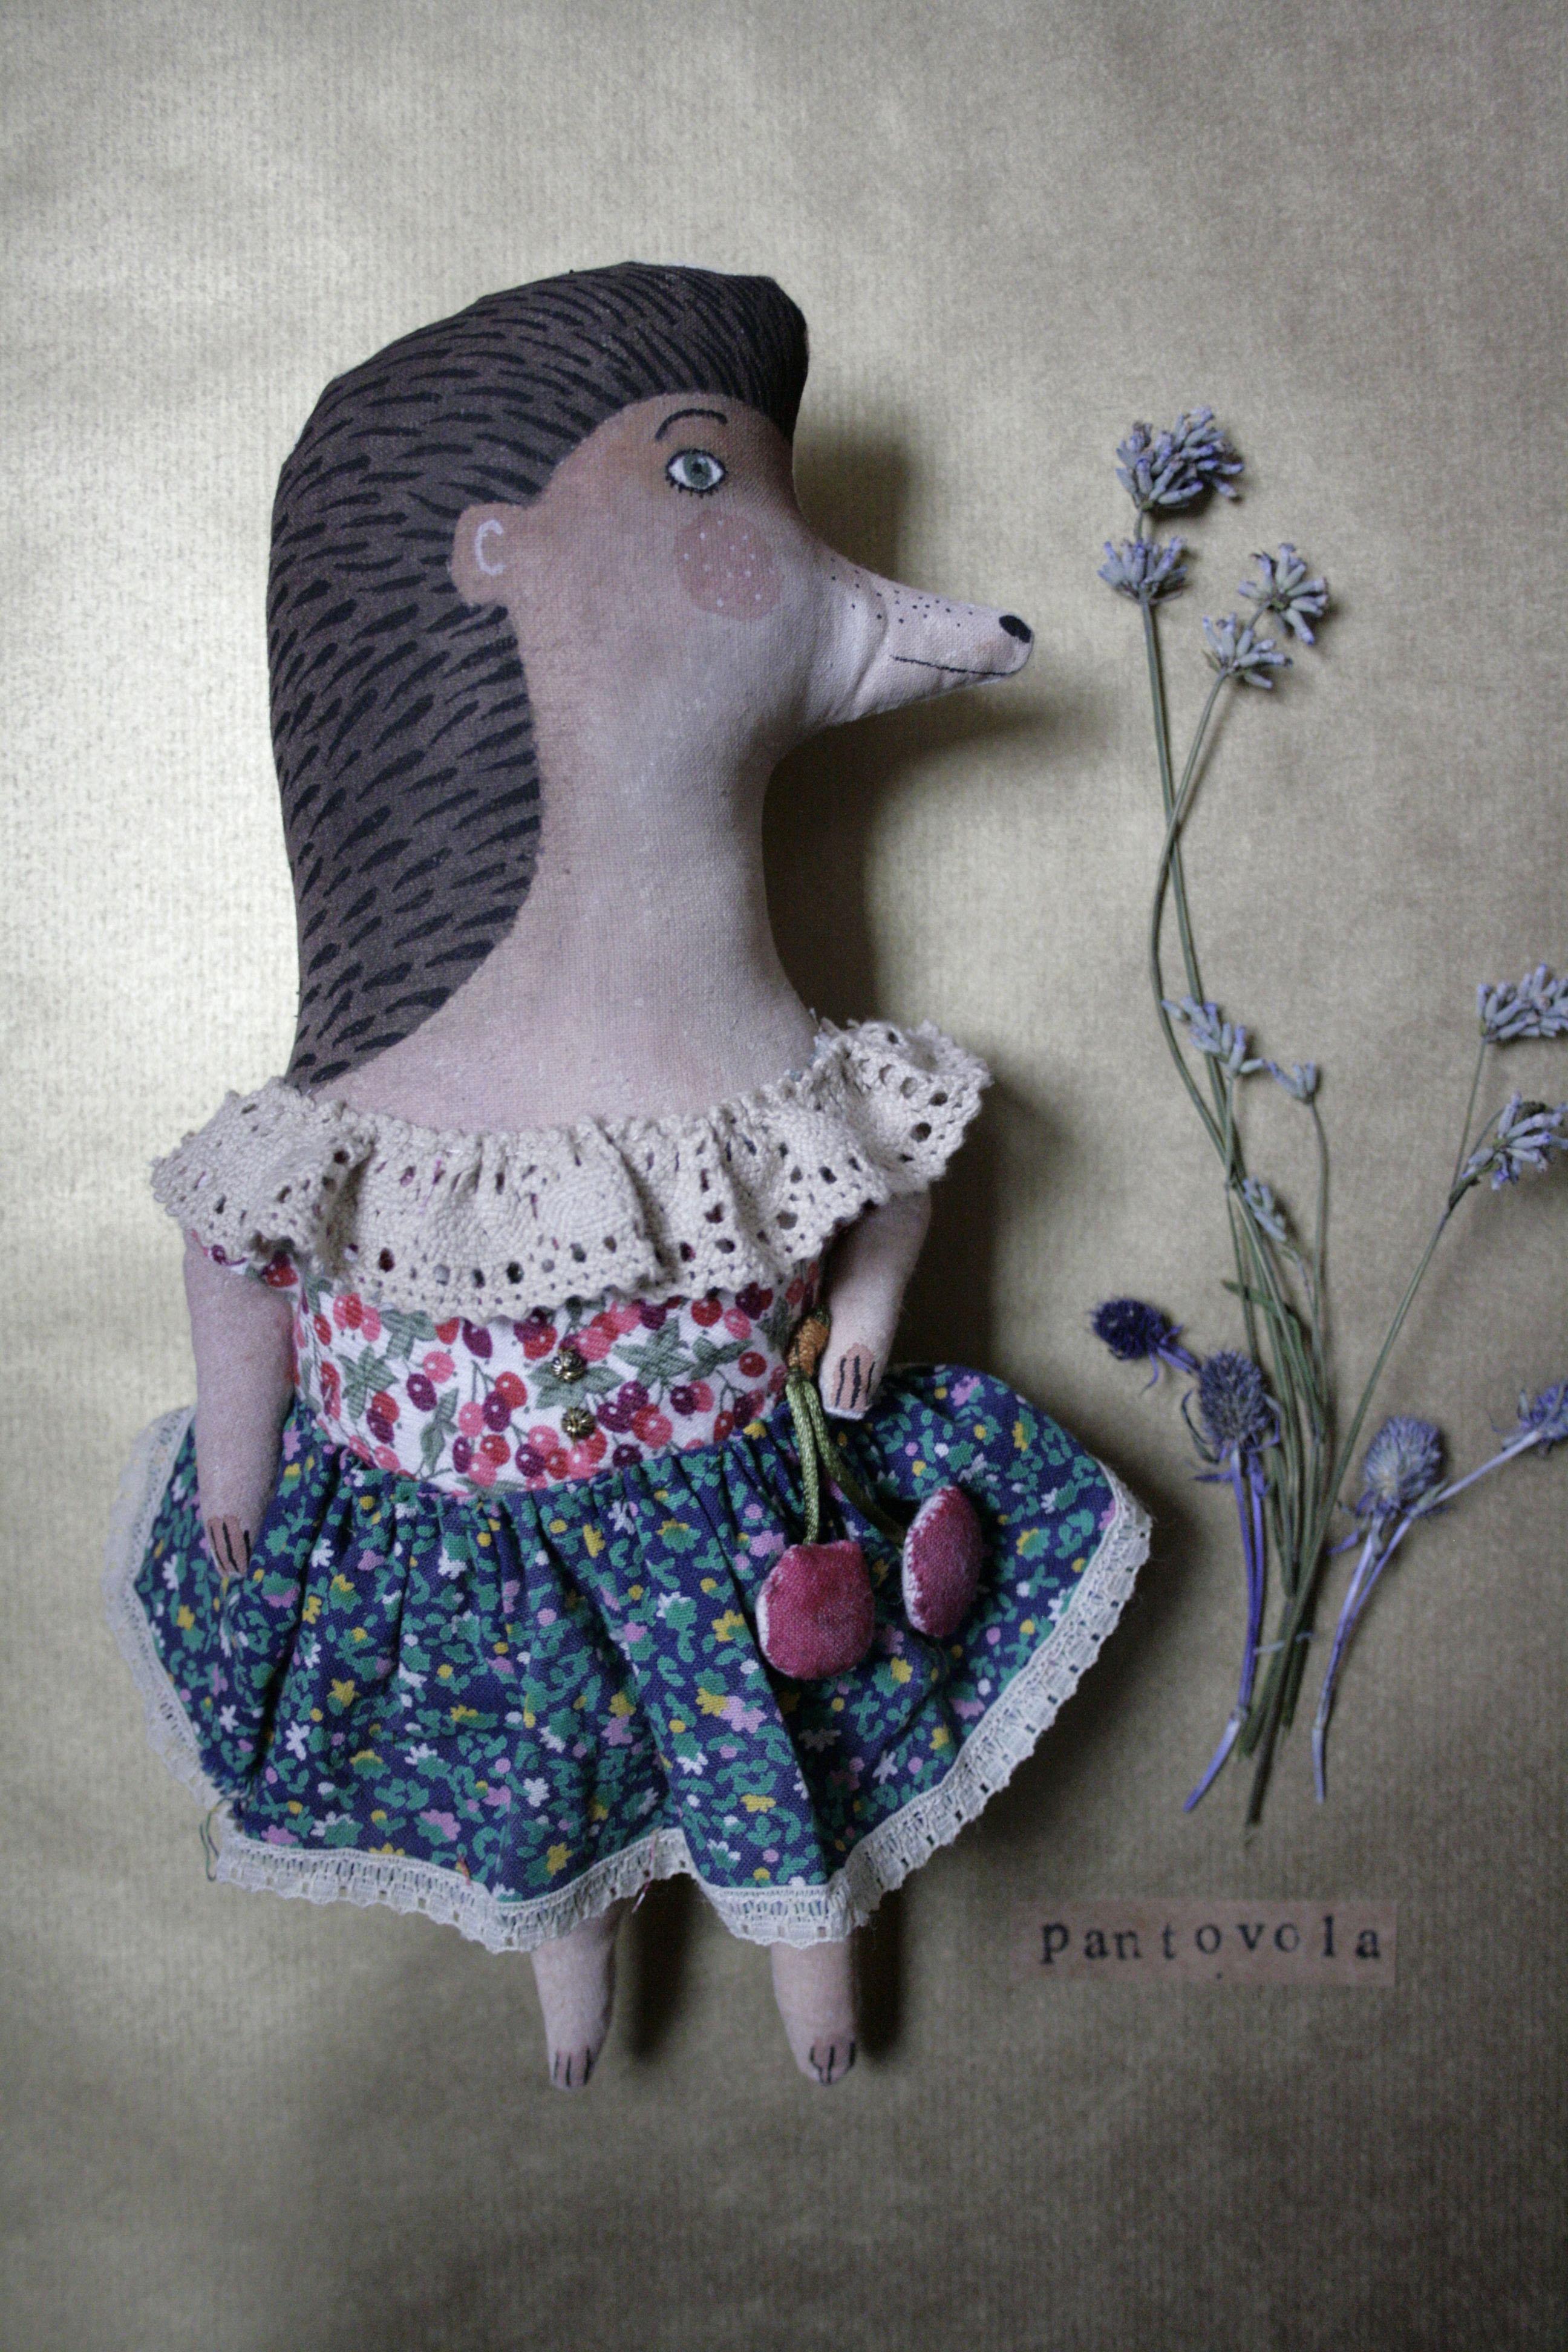 porcupine art doll